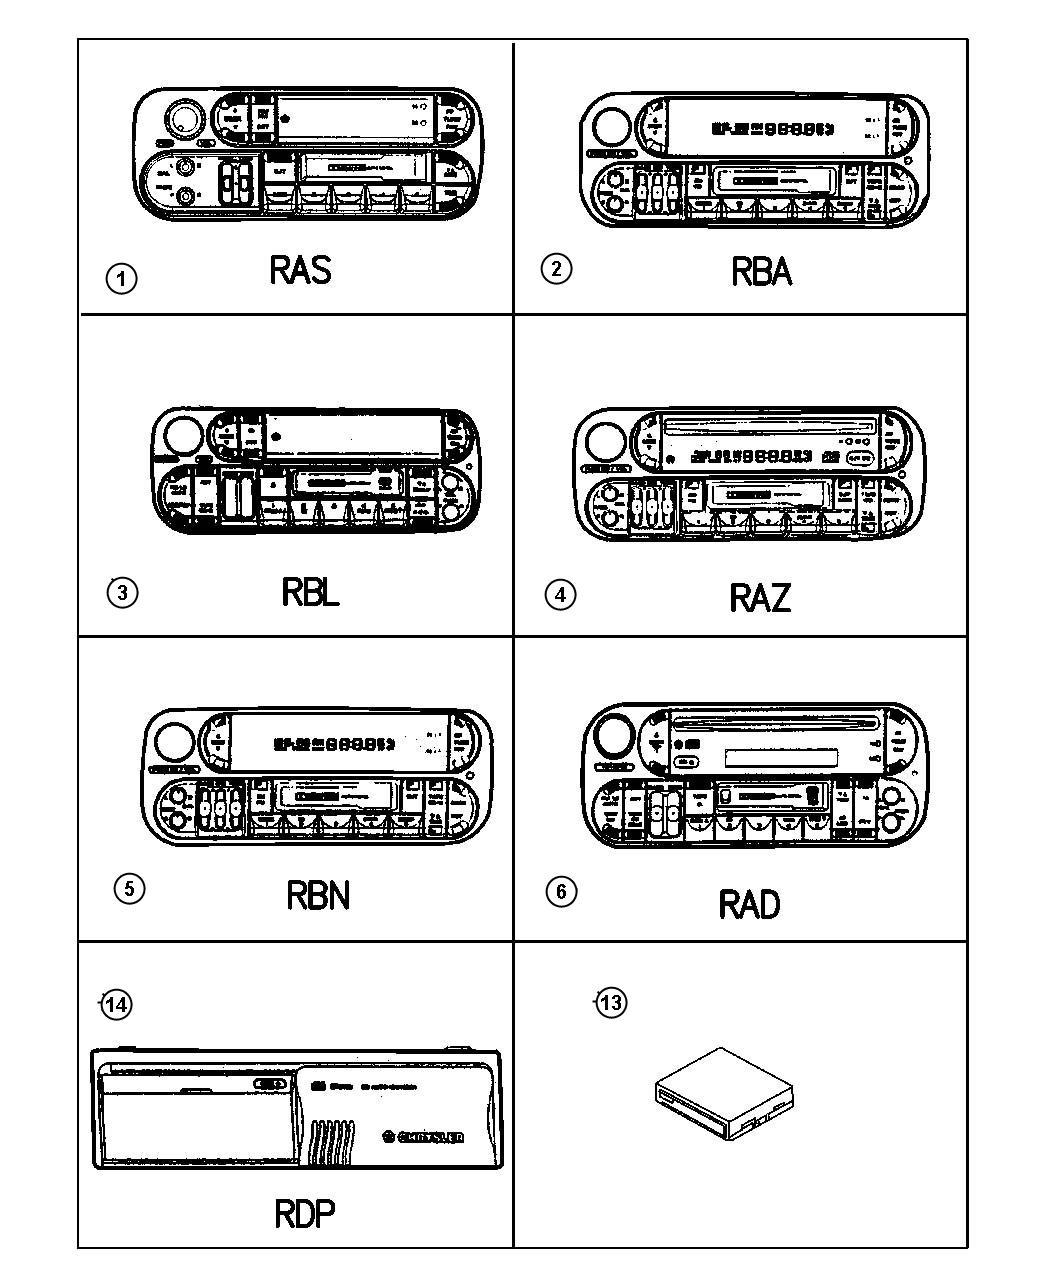 ShowAssembly also 6x9 Car Speaker Brackets further KCkFv03uiBw additionally Vehicle Antenna Mounts furthermore Silverado Subwoofer. on 2000 dodge ram radios that fit